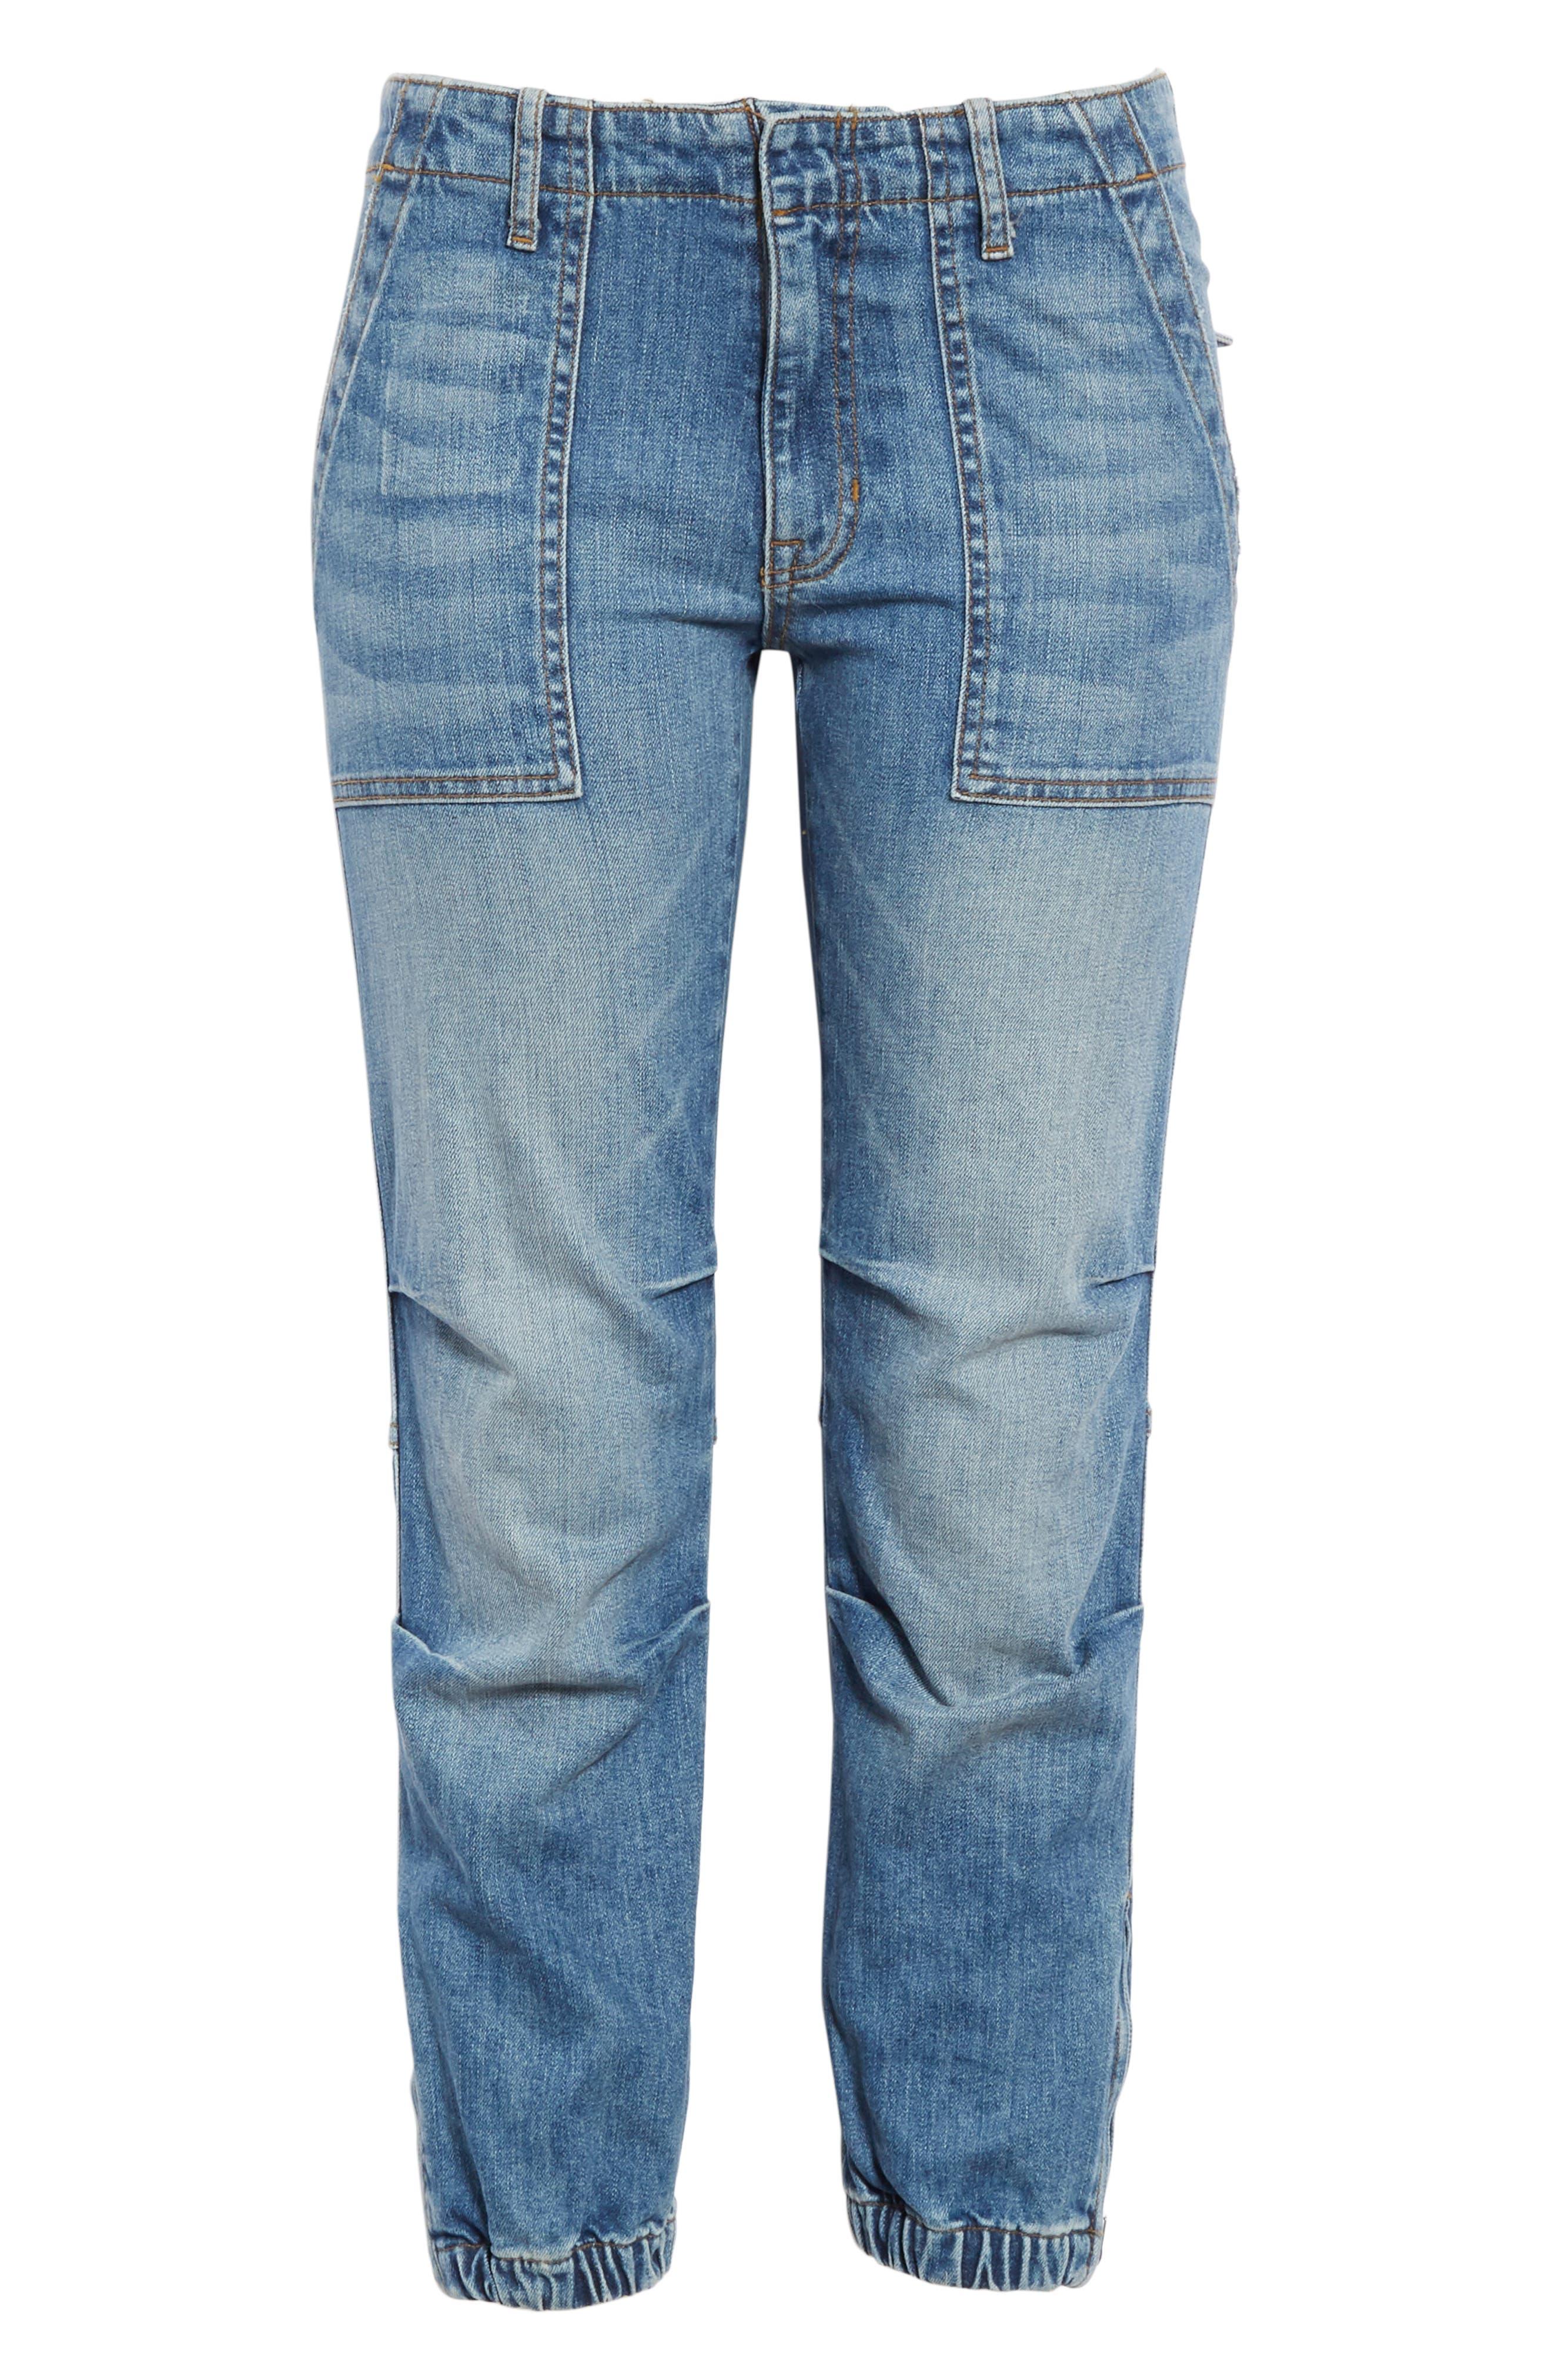 NILI LOTAN, Crop French Military Jeans, Alternate thumbnail 7, color, DUANE WASH